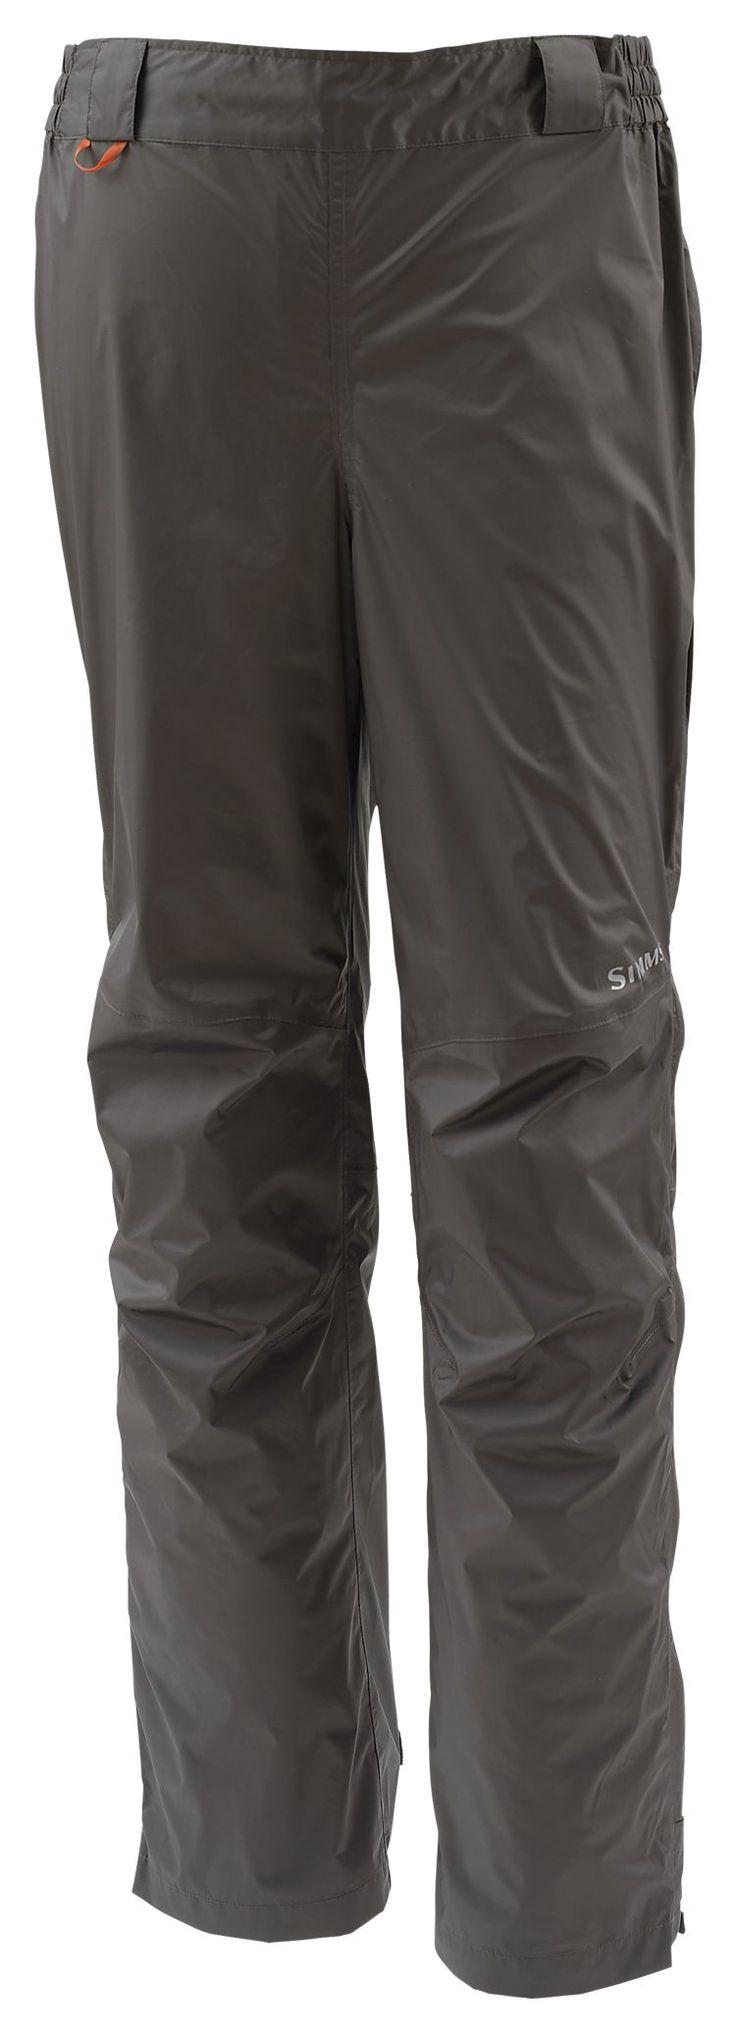 25 cute rain pants ideas on pinterest snowshoe skiing for Bass fishing rain gear